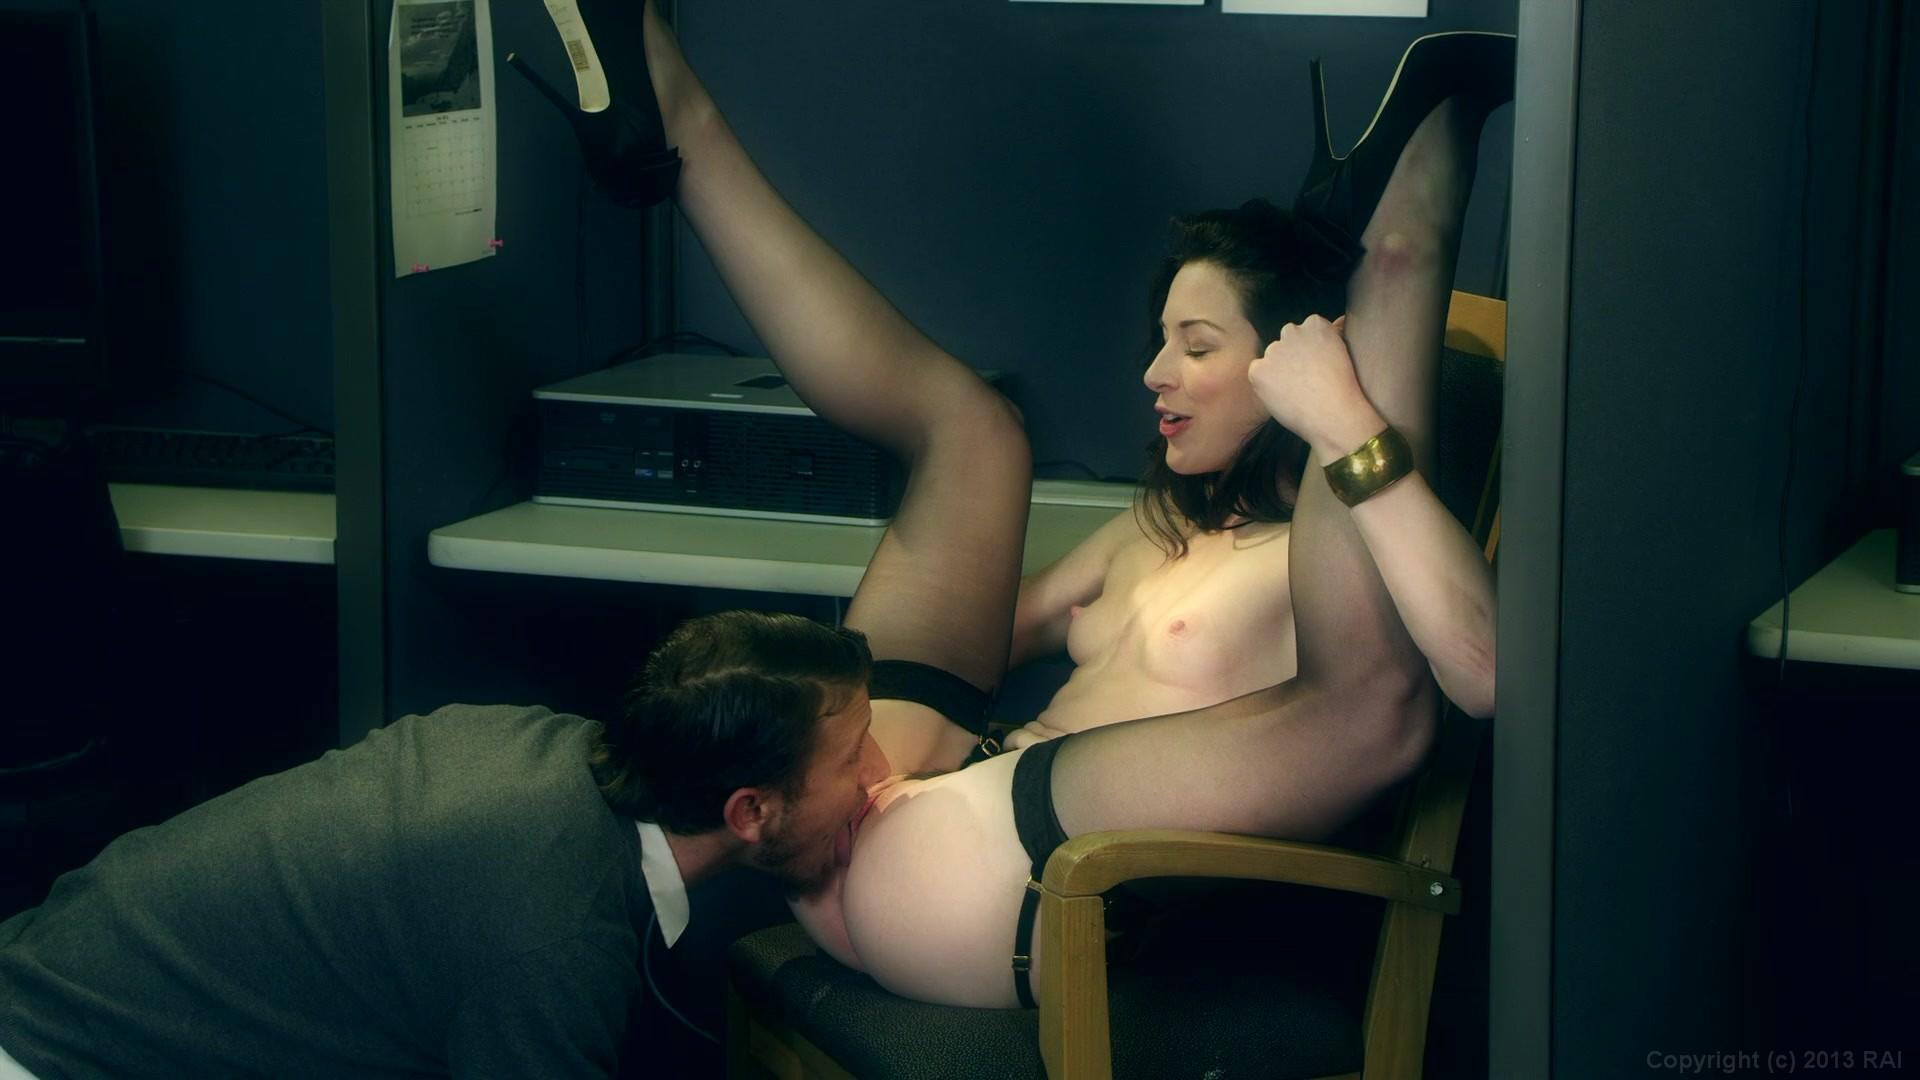 Секс в екатеринбурге онлайн 4 фотография